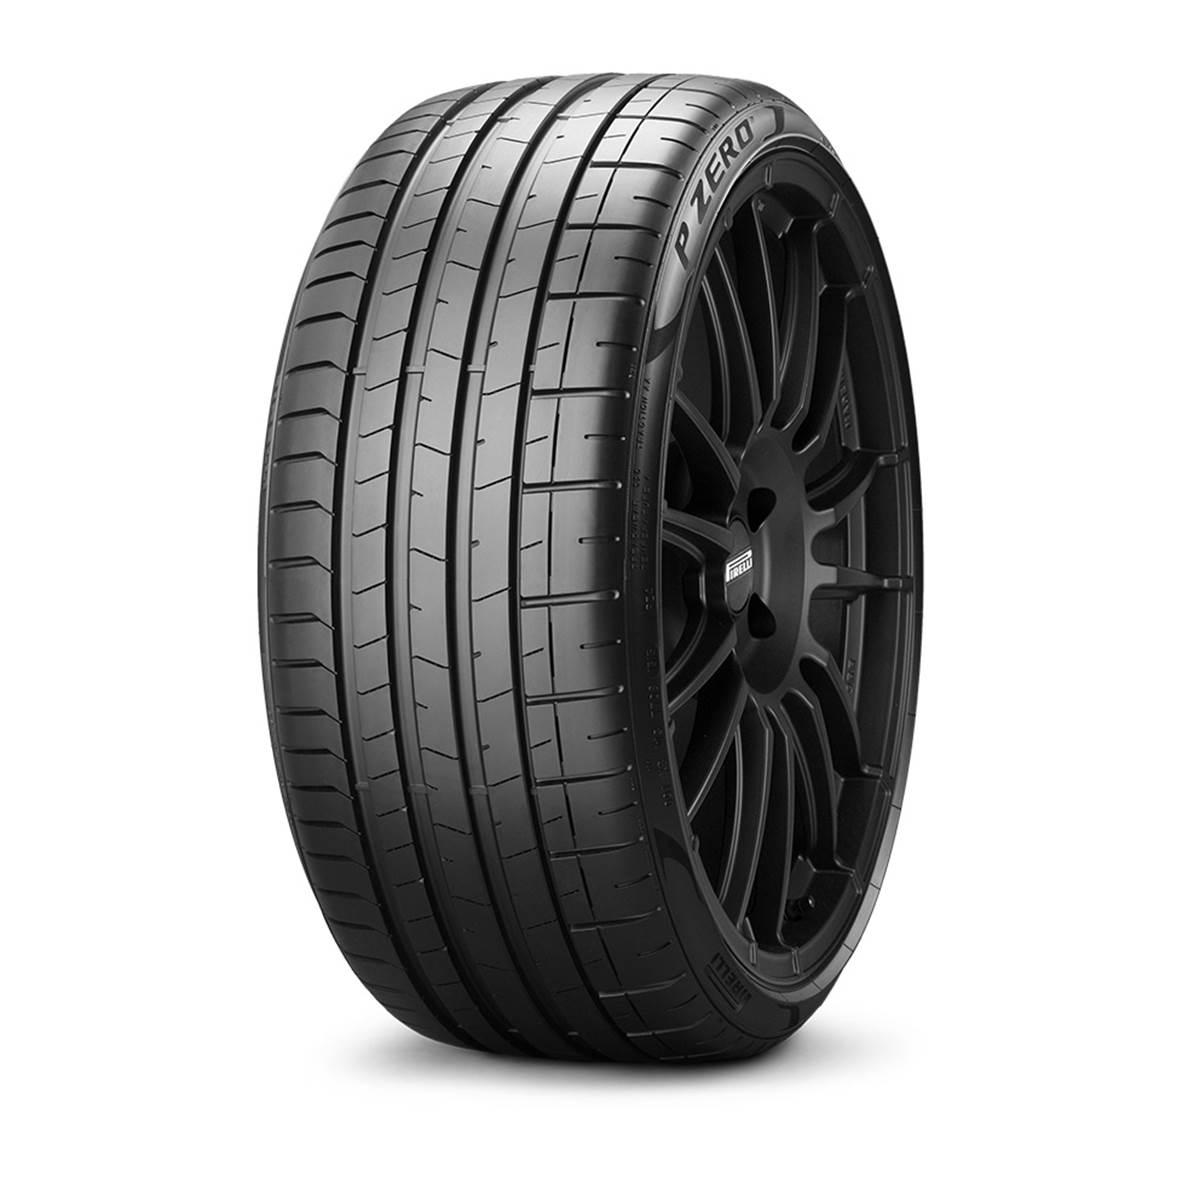 Pneu Pirelli 295/30R20 101Y P-Zero